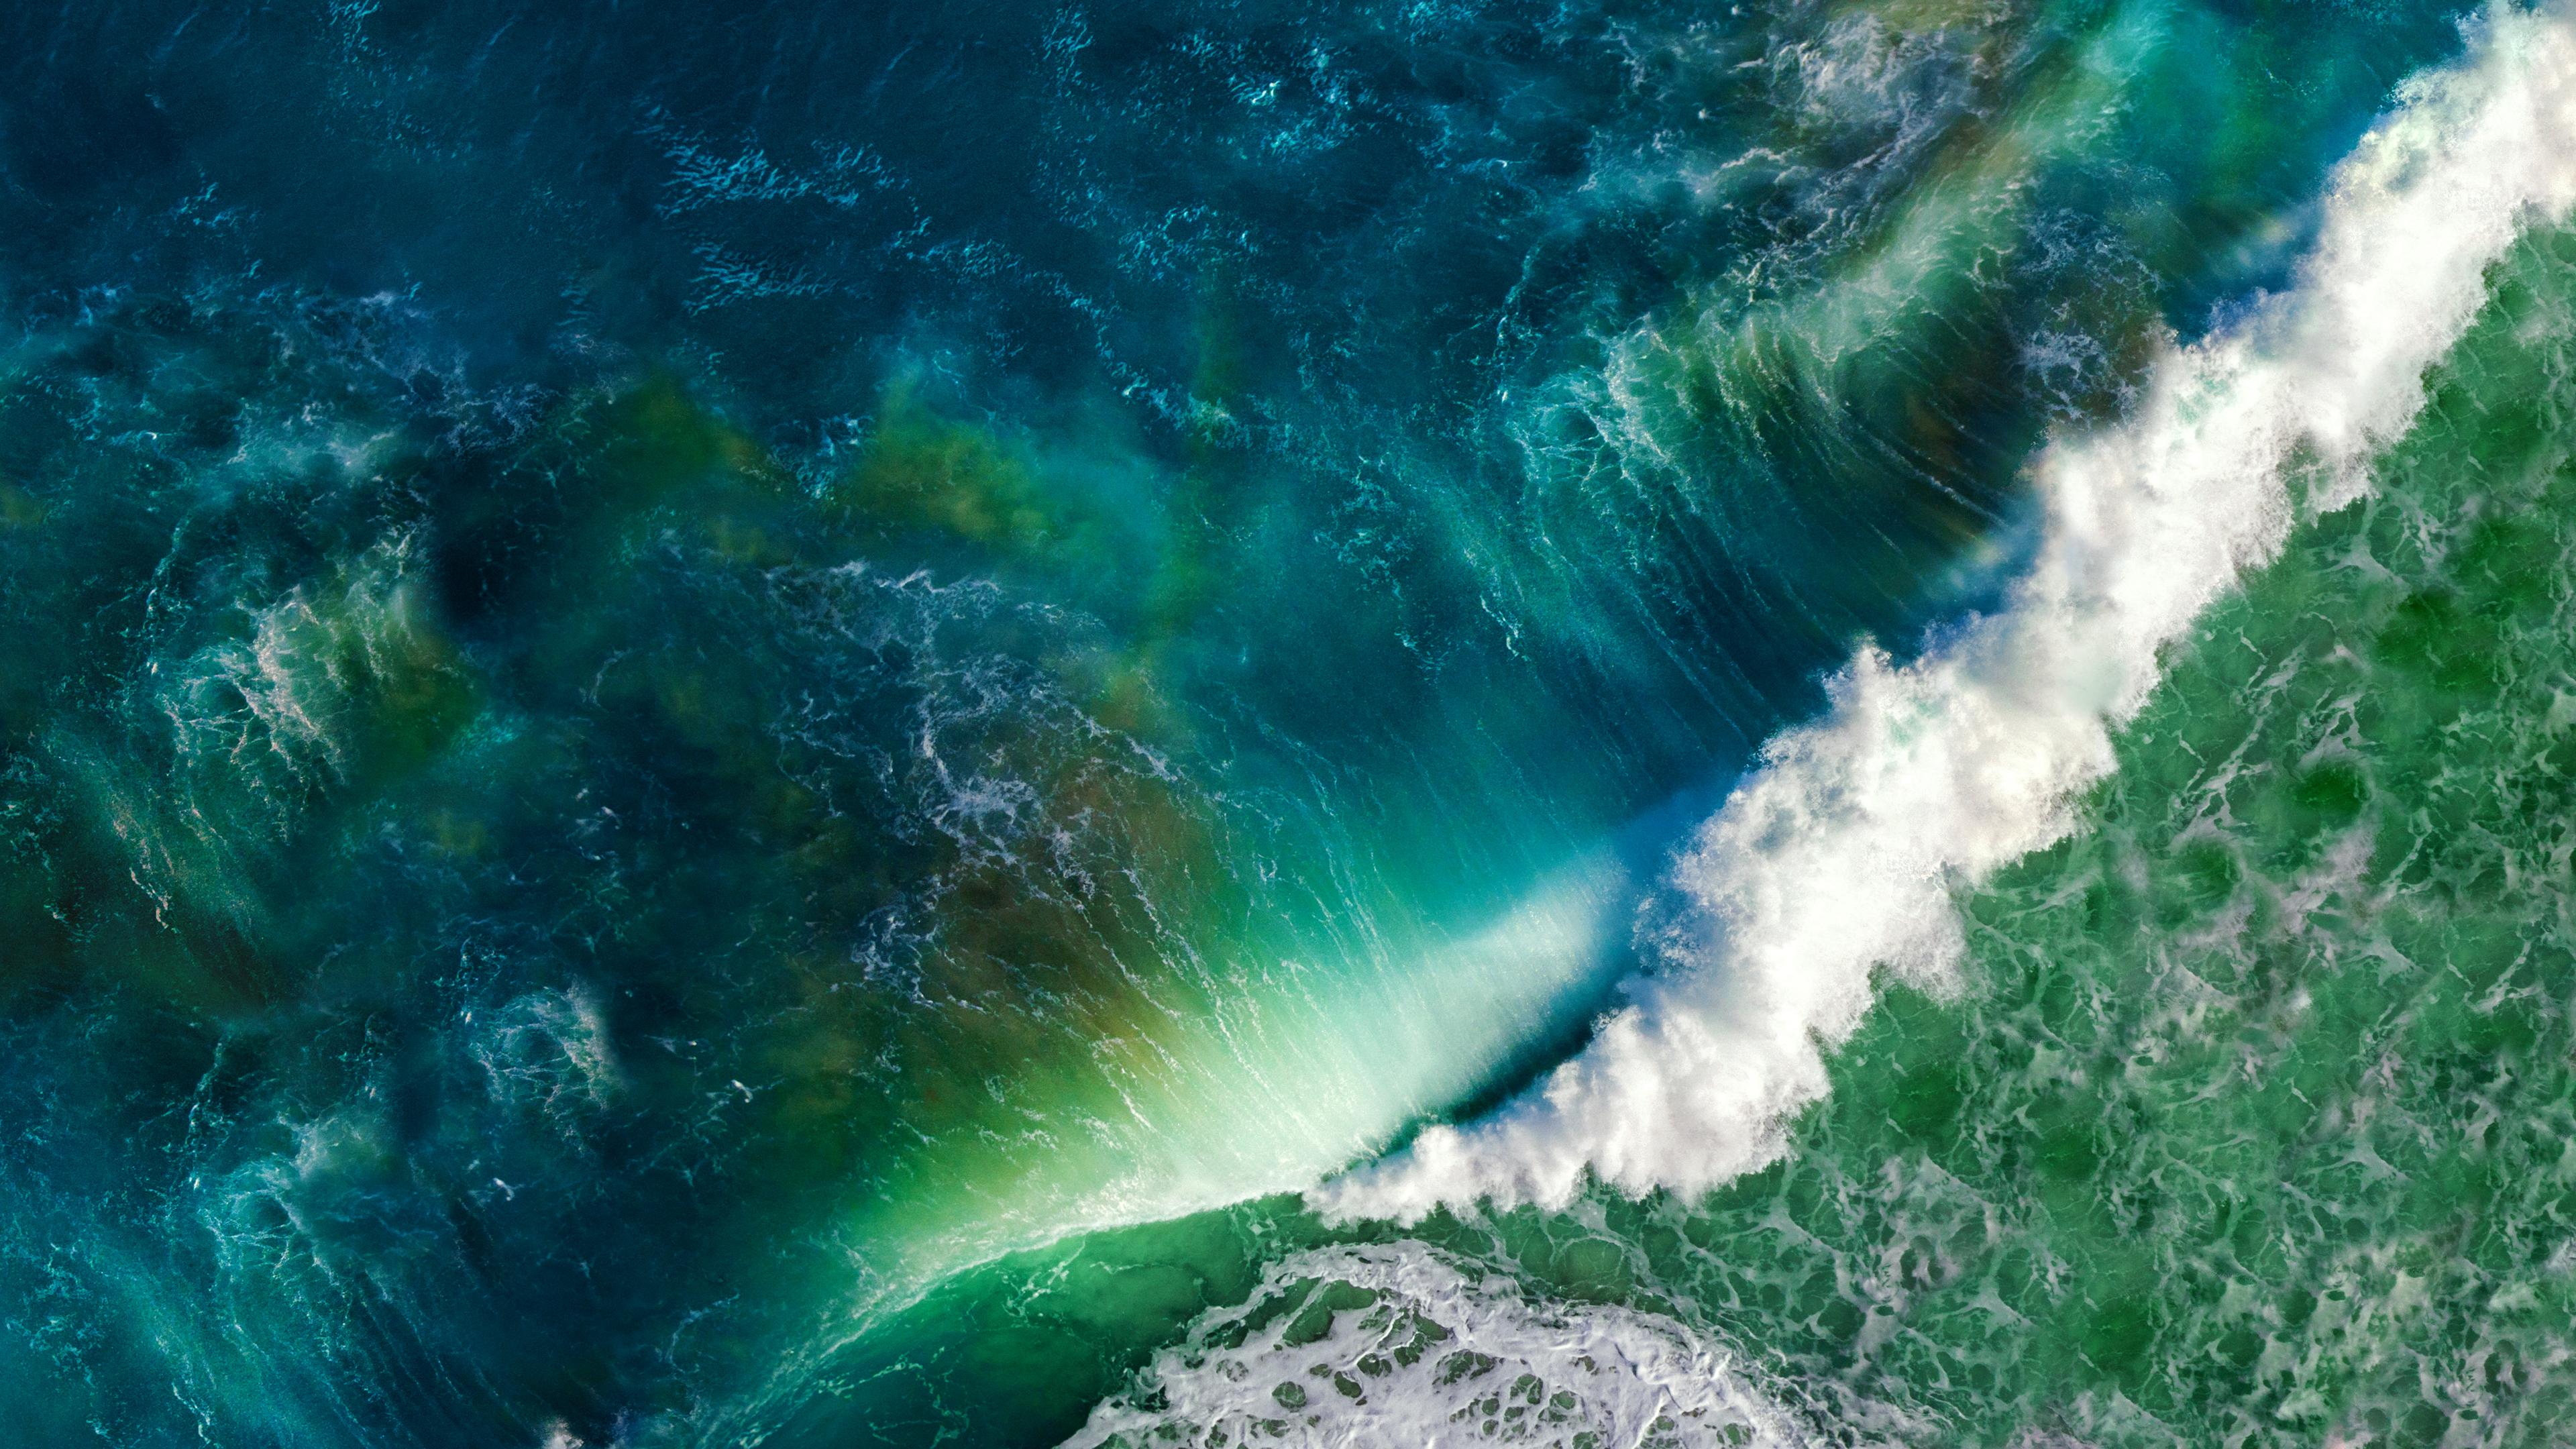 General 3840x2160 waves sea sea foam colorful anime